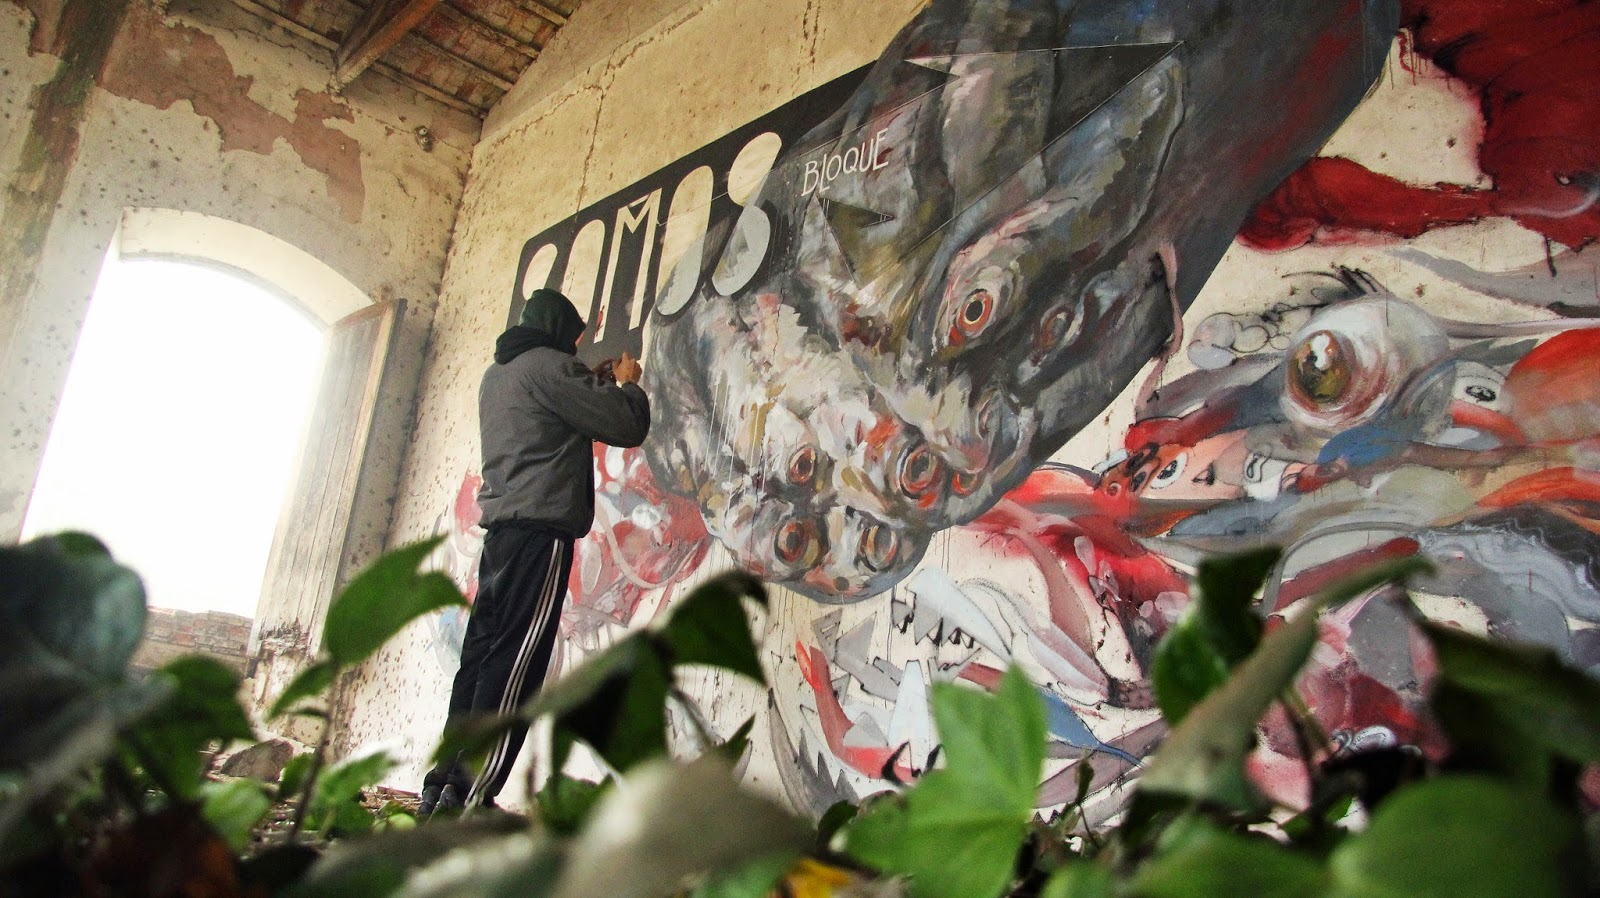 laguna-emilio-cerezo-xabier-xtrm-new-mural-04